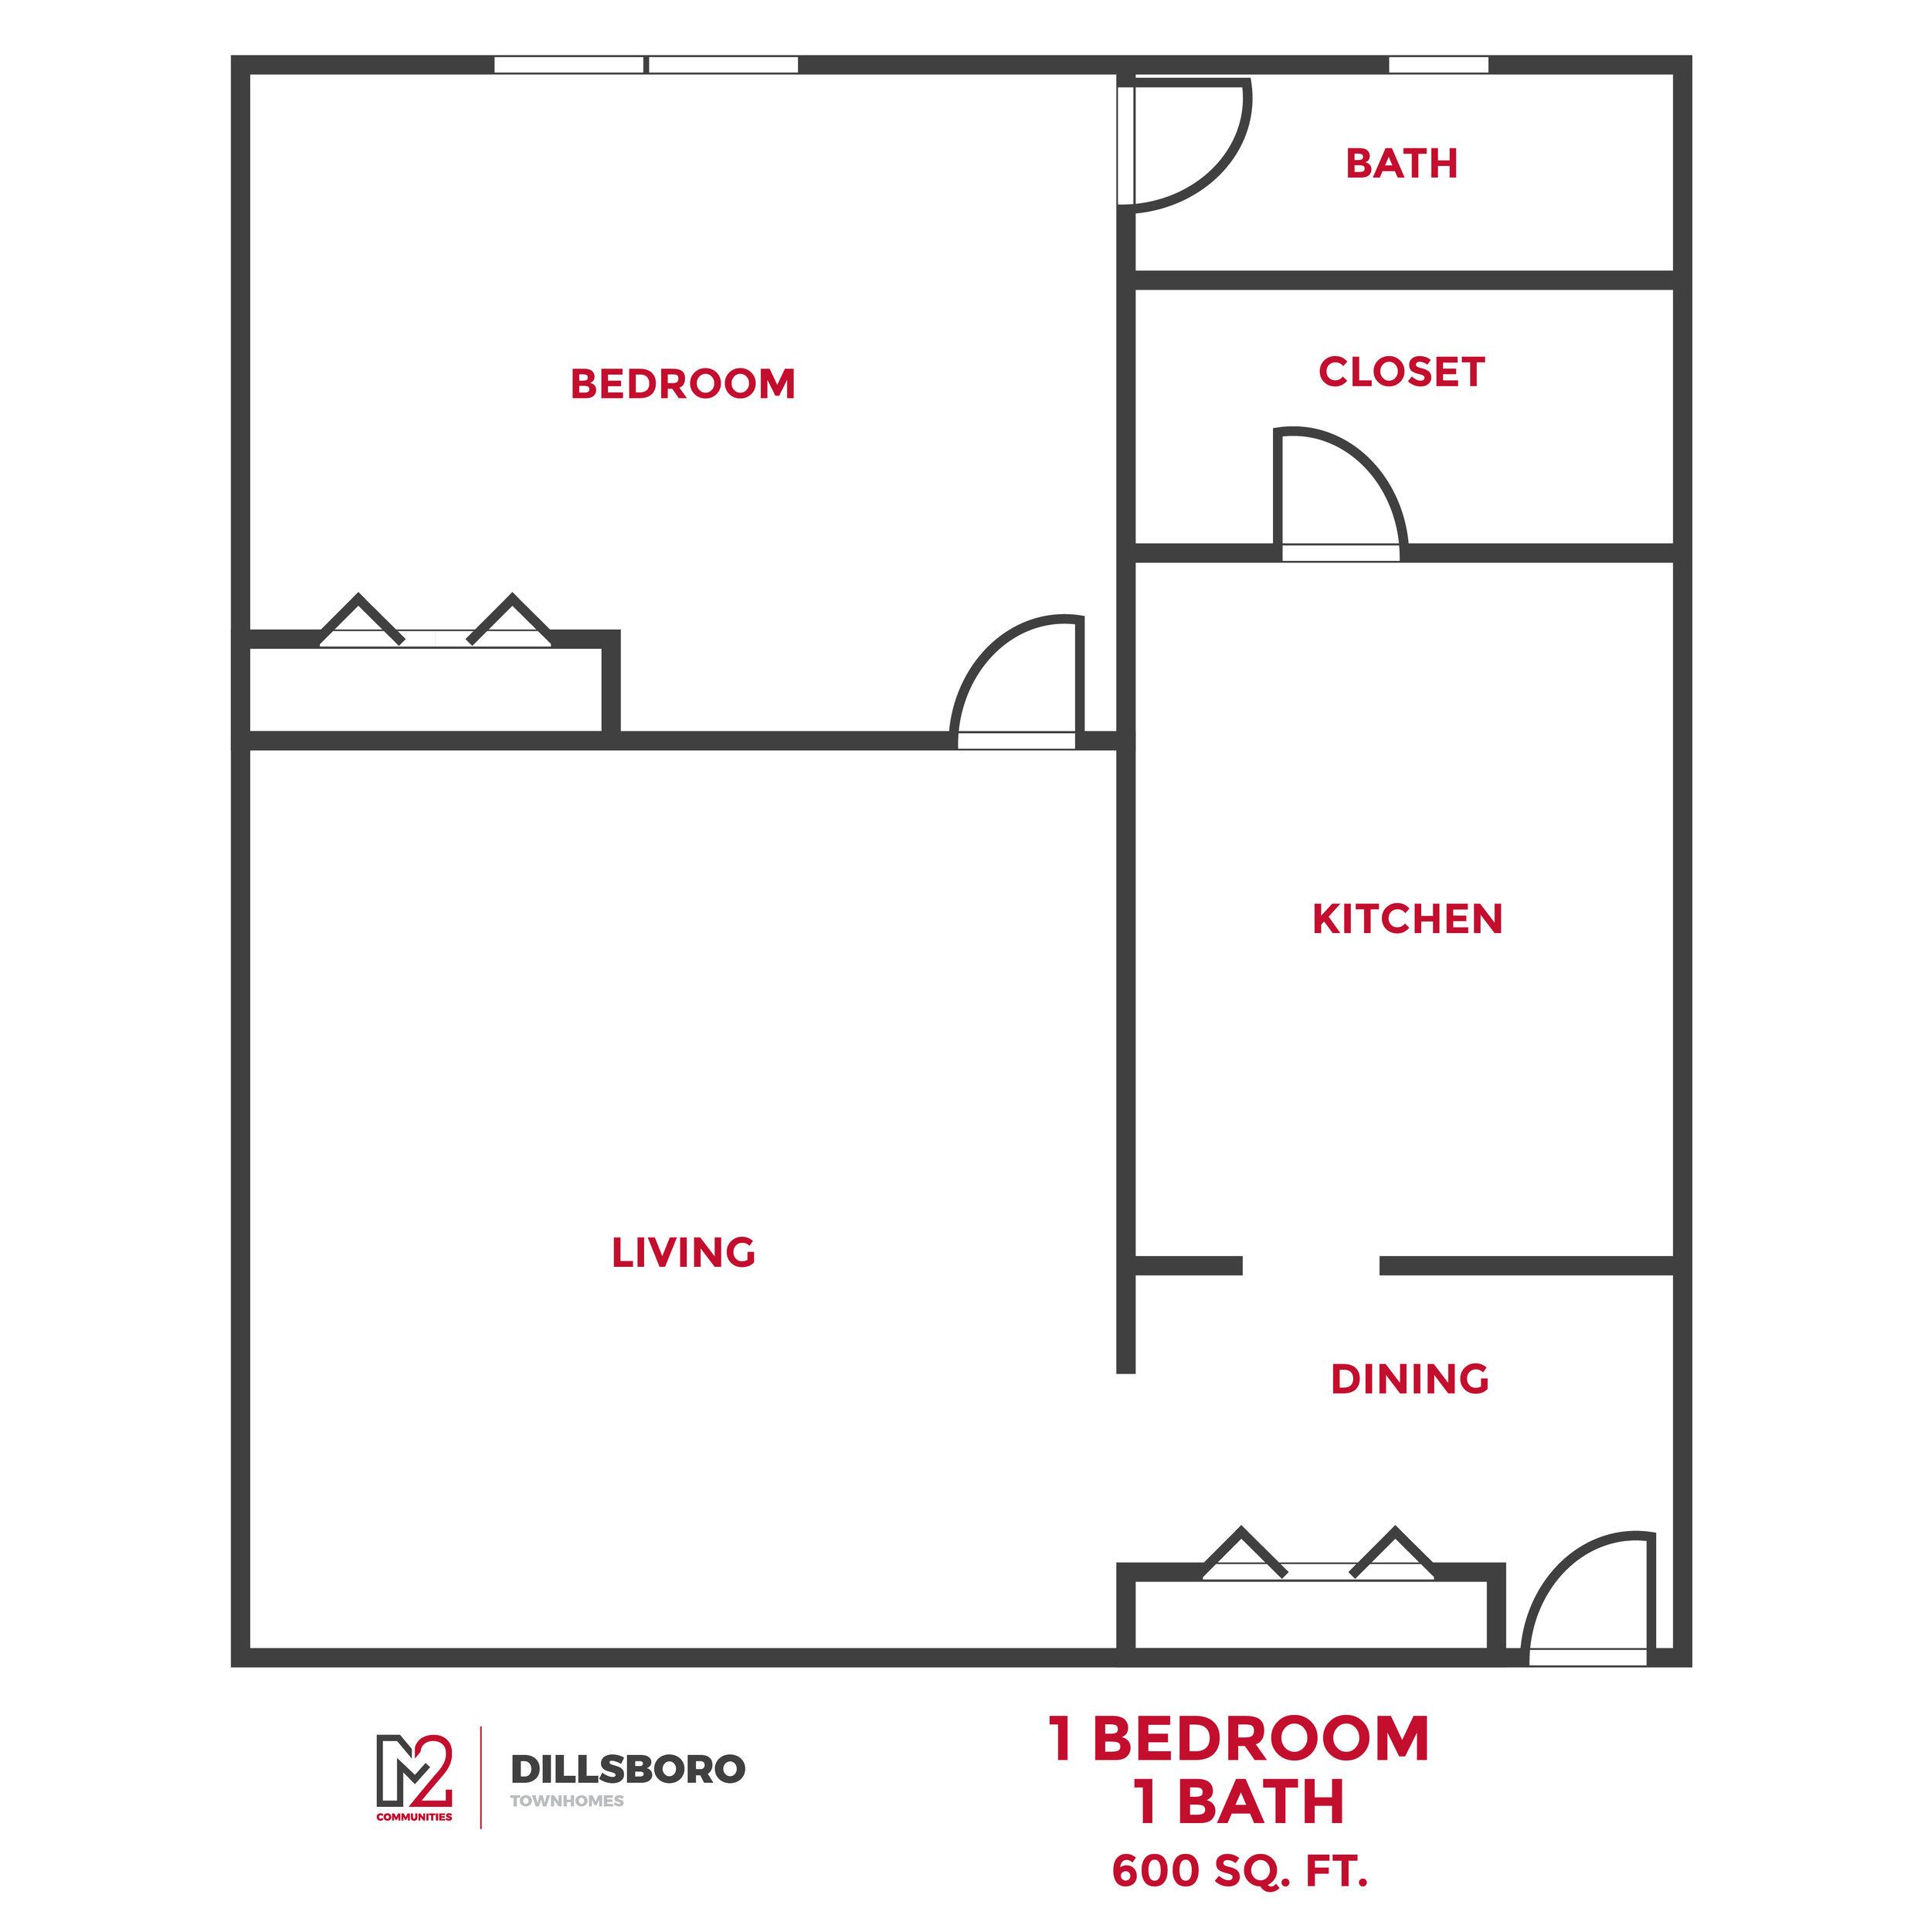 M2_Dillsboro_Floorplans-06.jpg